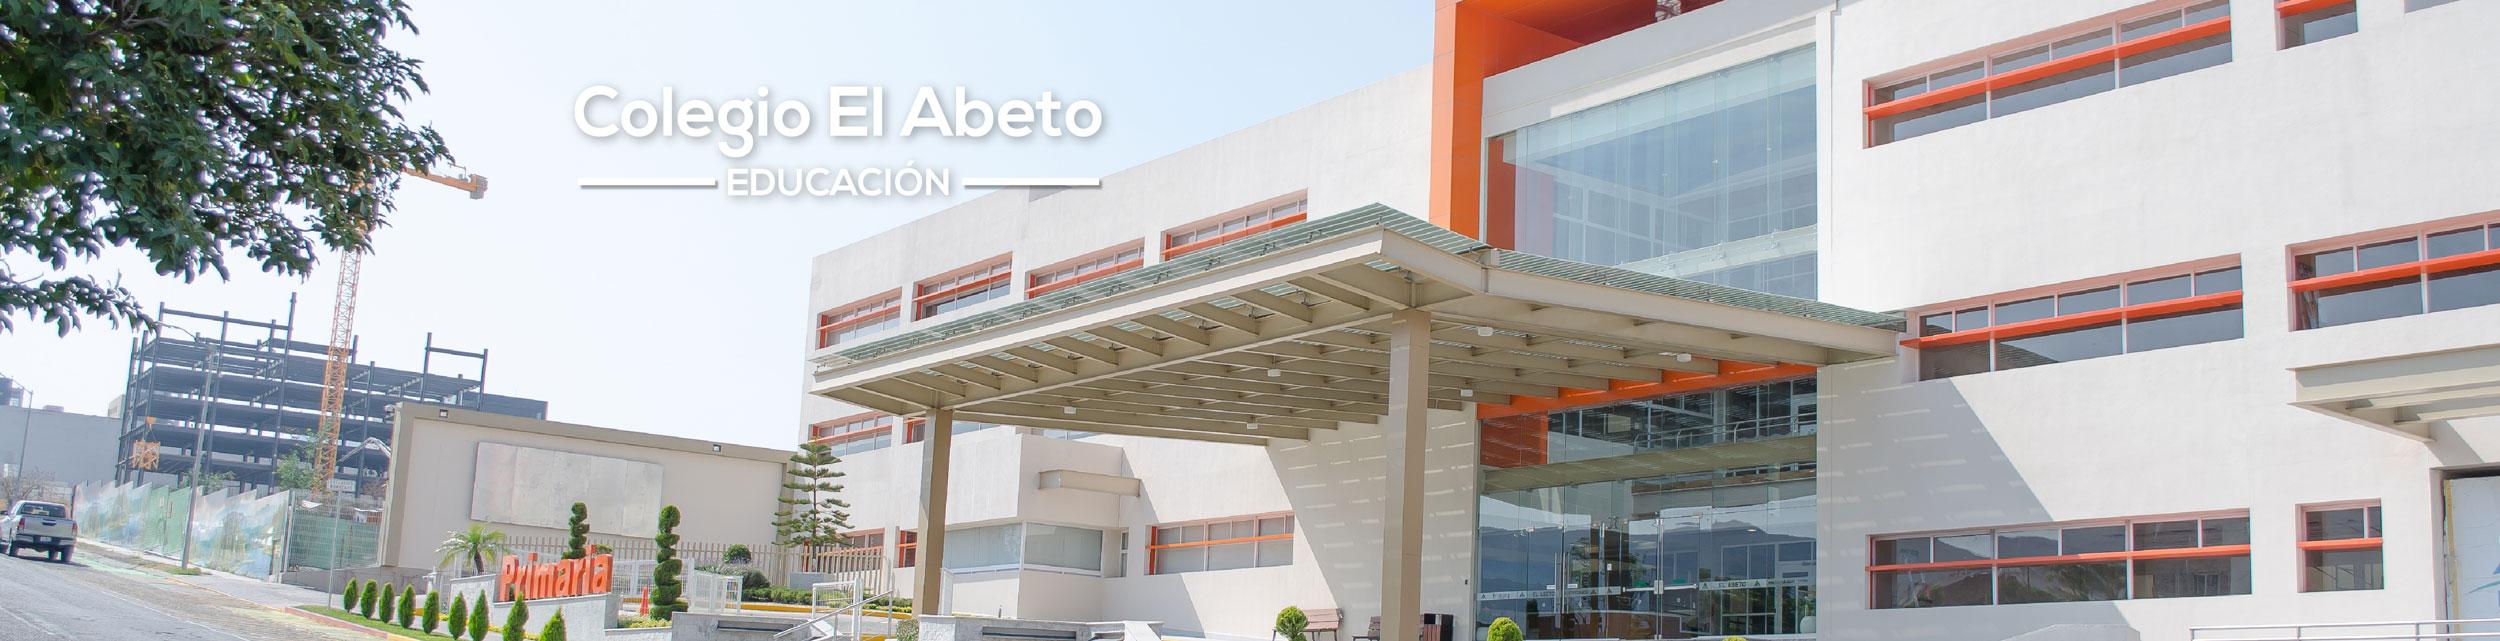 banner-arriba-05